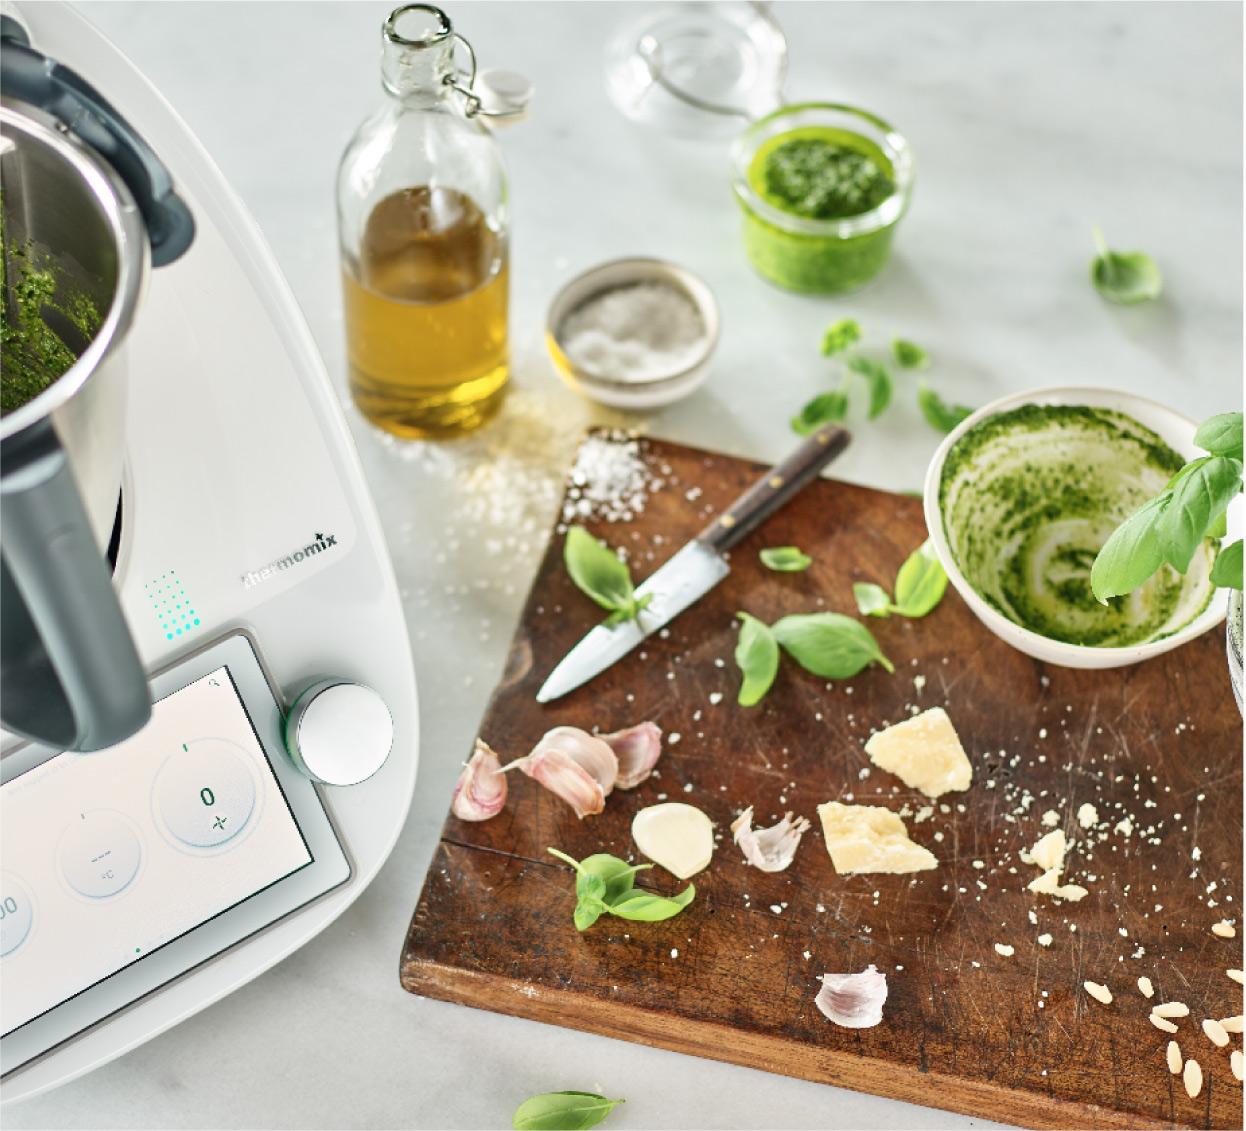 Pesto genovese préparé au Thermomix.